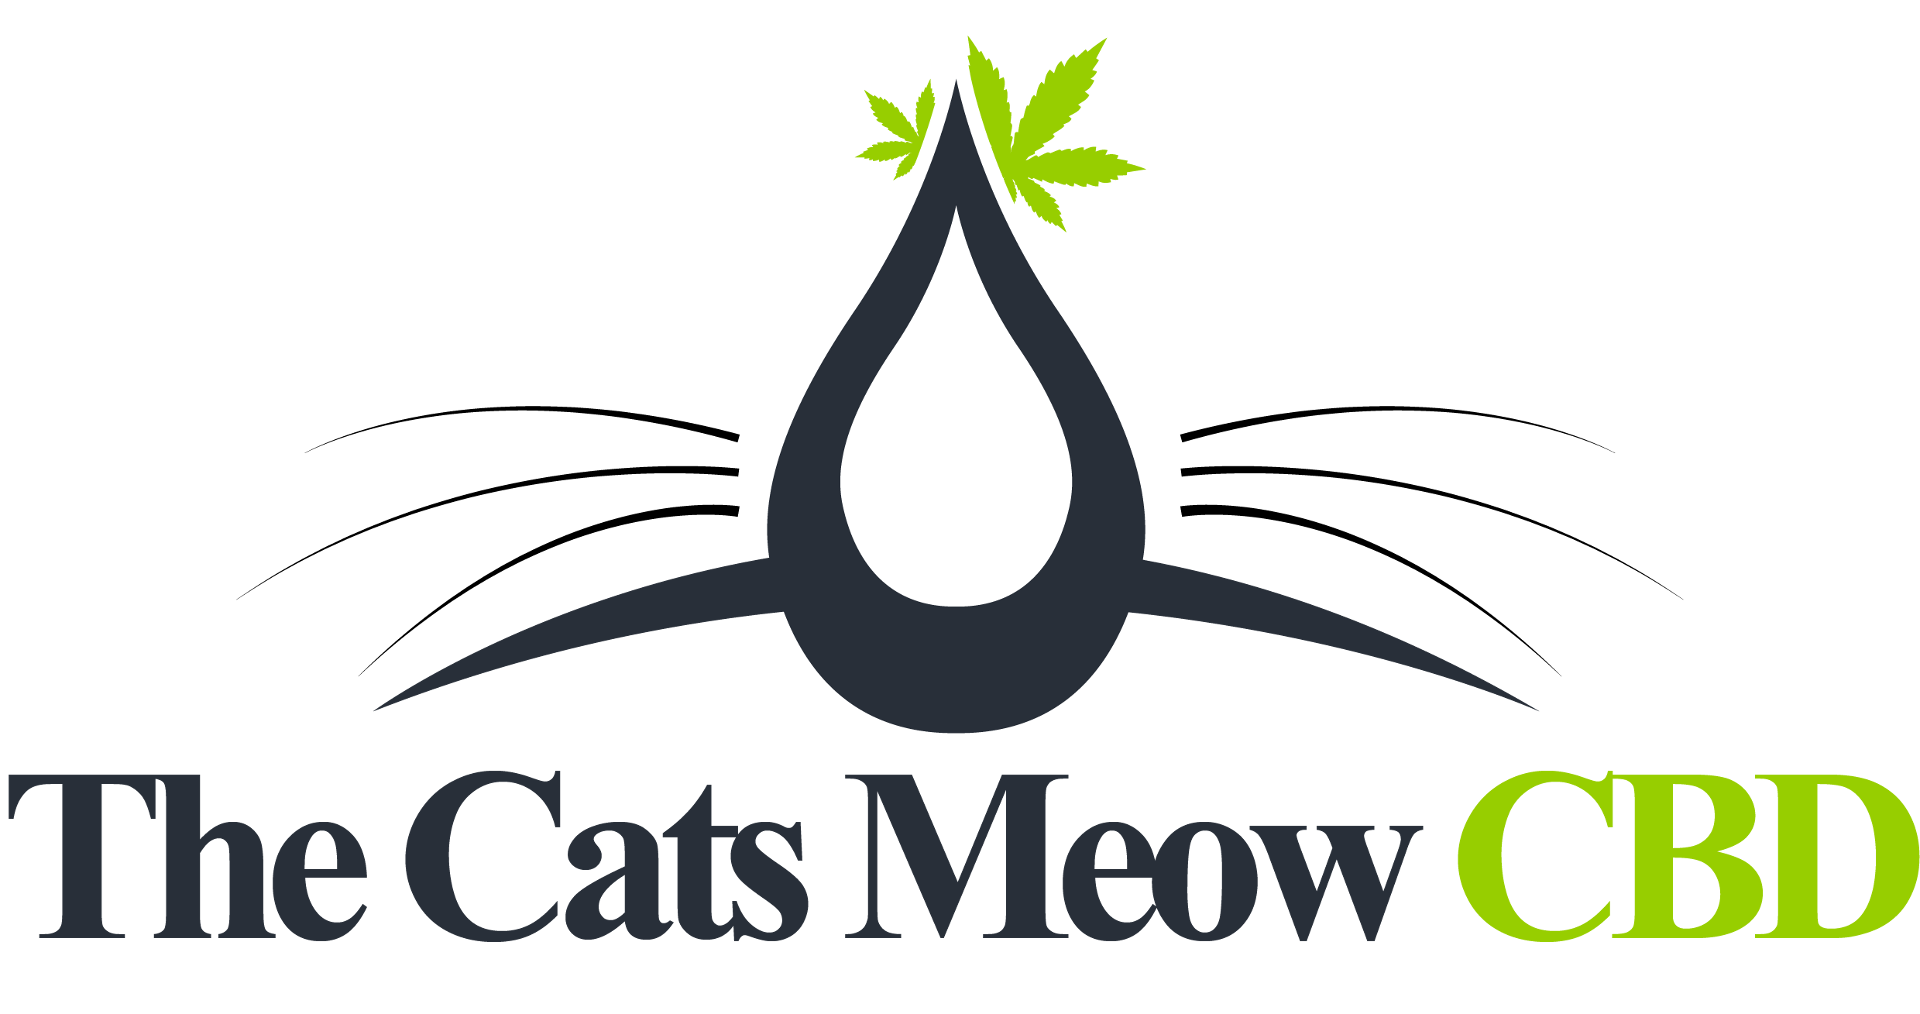 The Cats Meow Logo